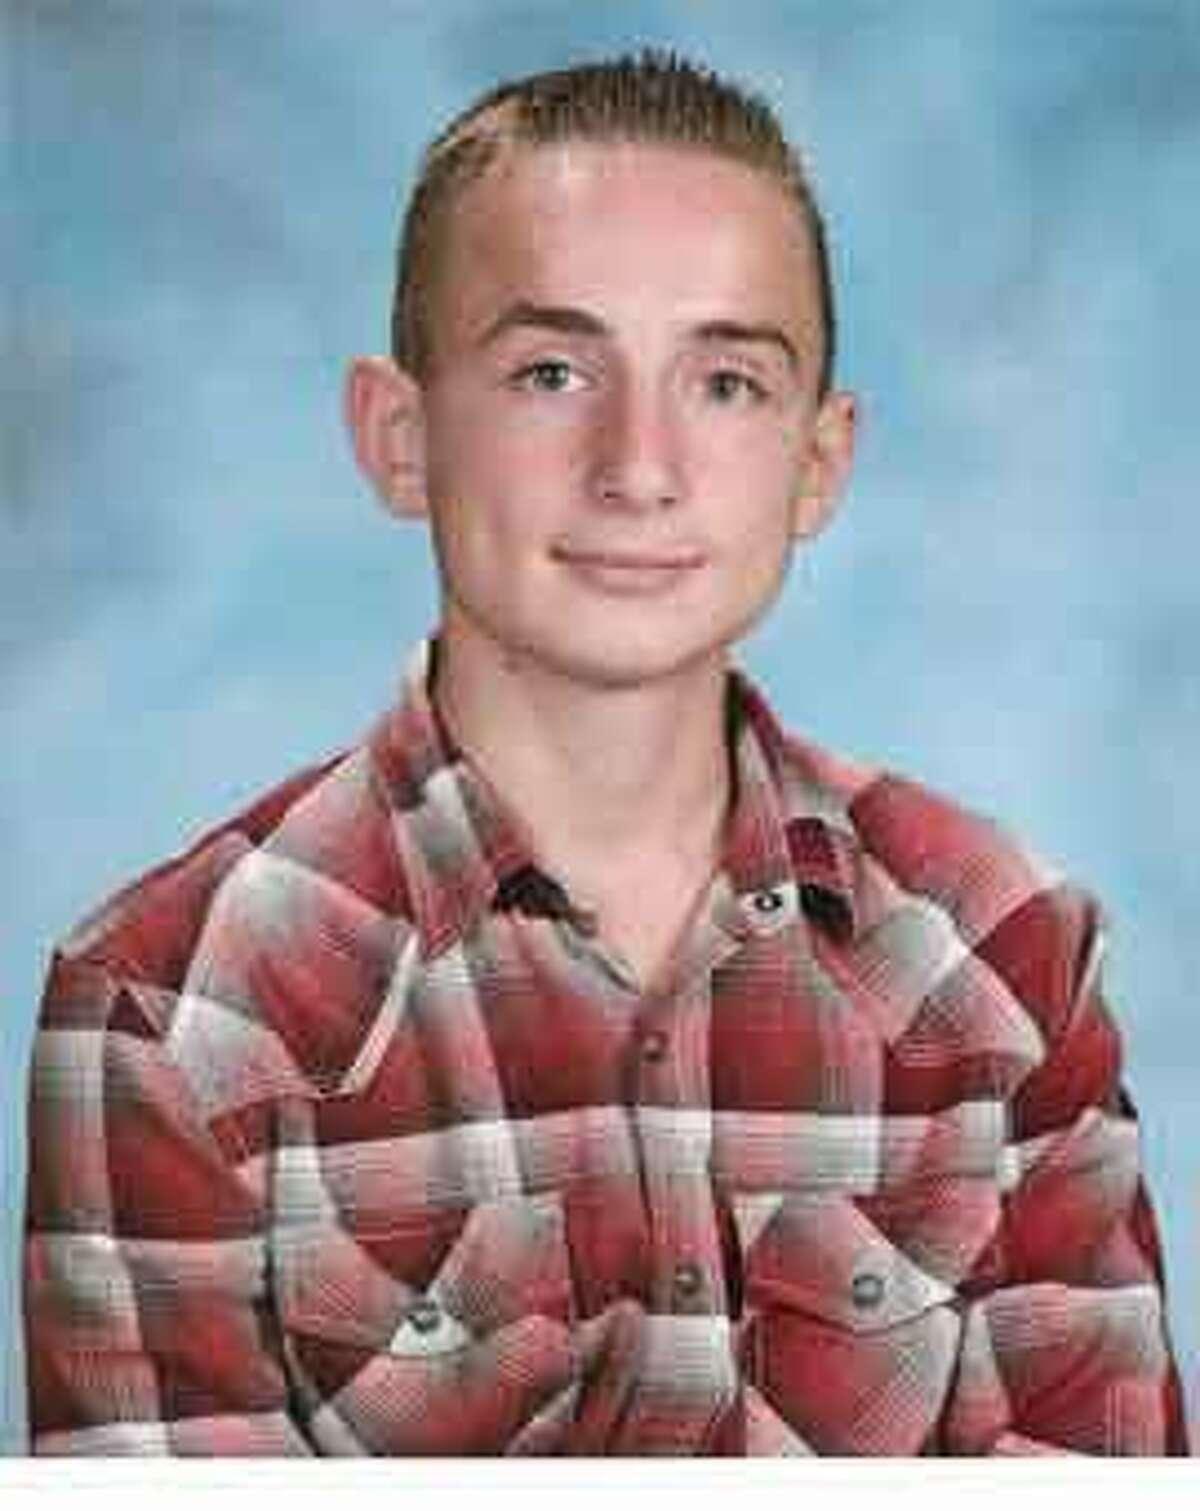 A Shelton High School yearbook photo of Kristjan Ndoj released by the Shelton Police Department.